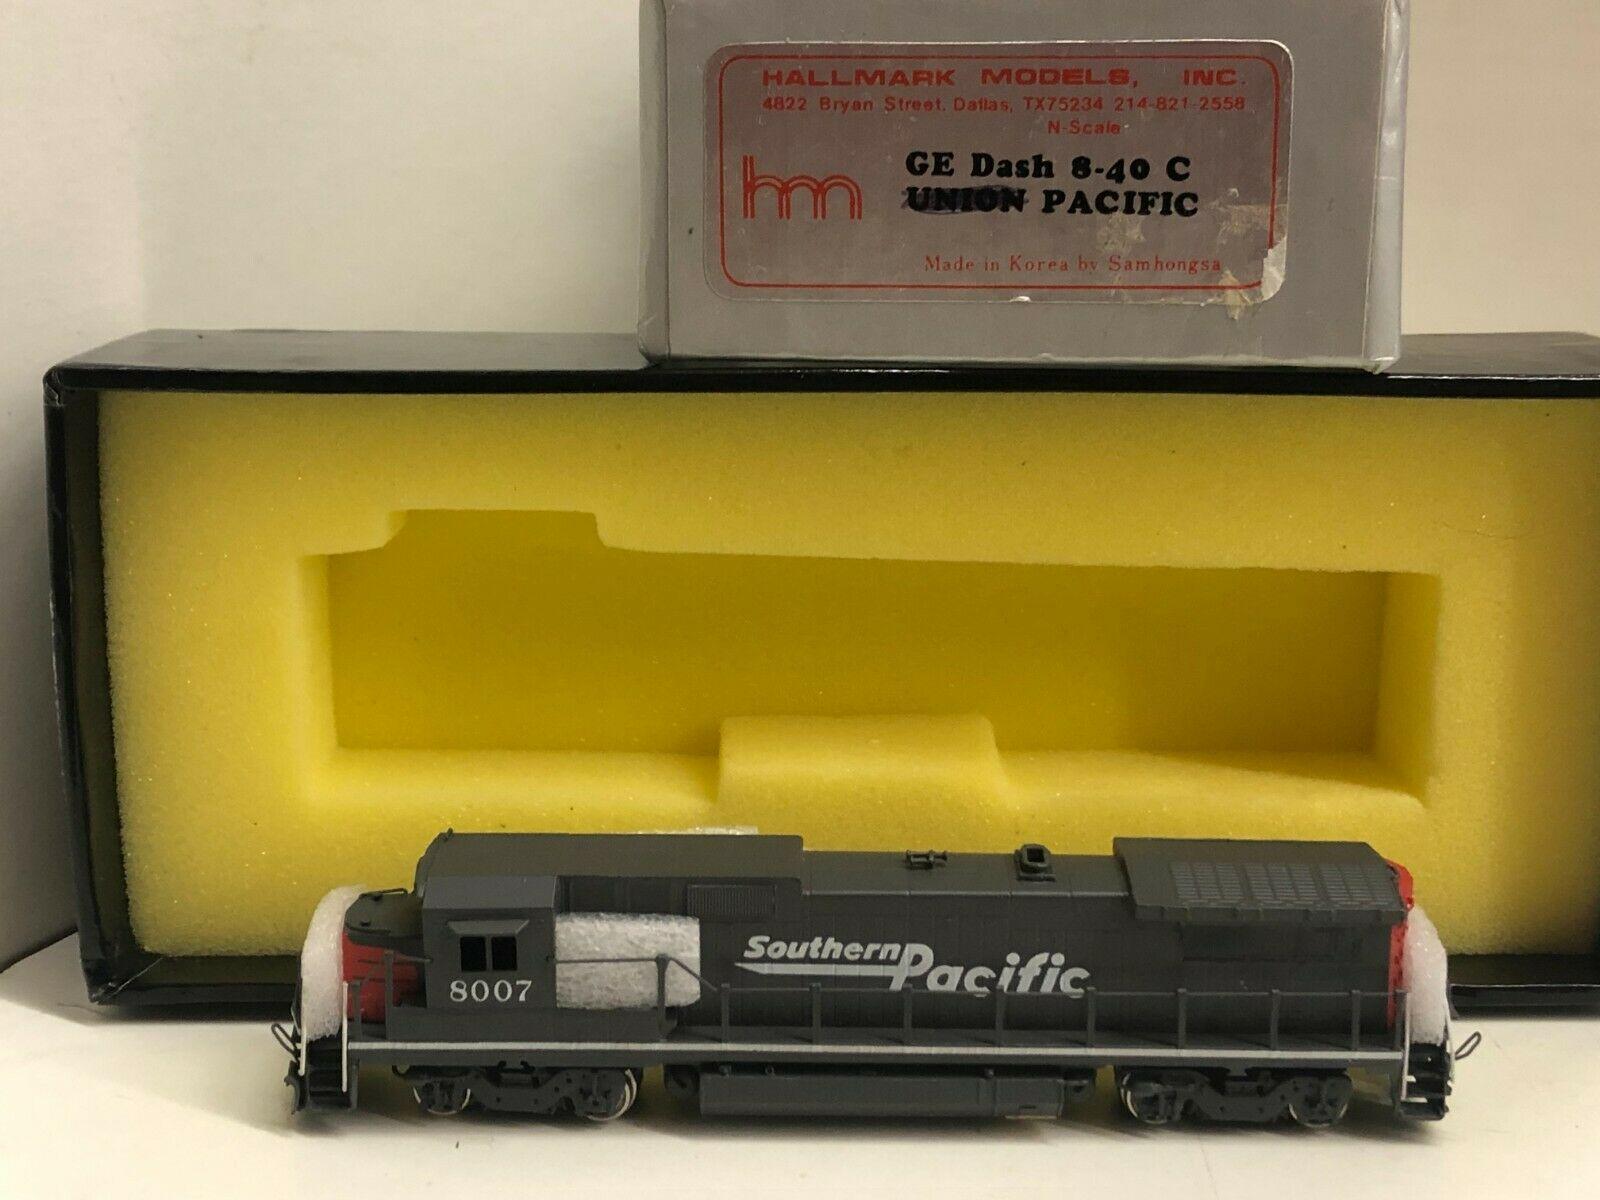 N Scale - Hallmark Models - A14 - Locomotive, Diesel, GE Dash 8 - Southern Pacific - 8007